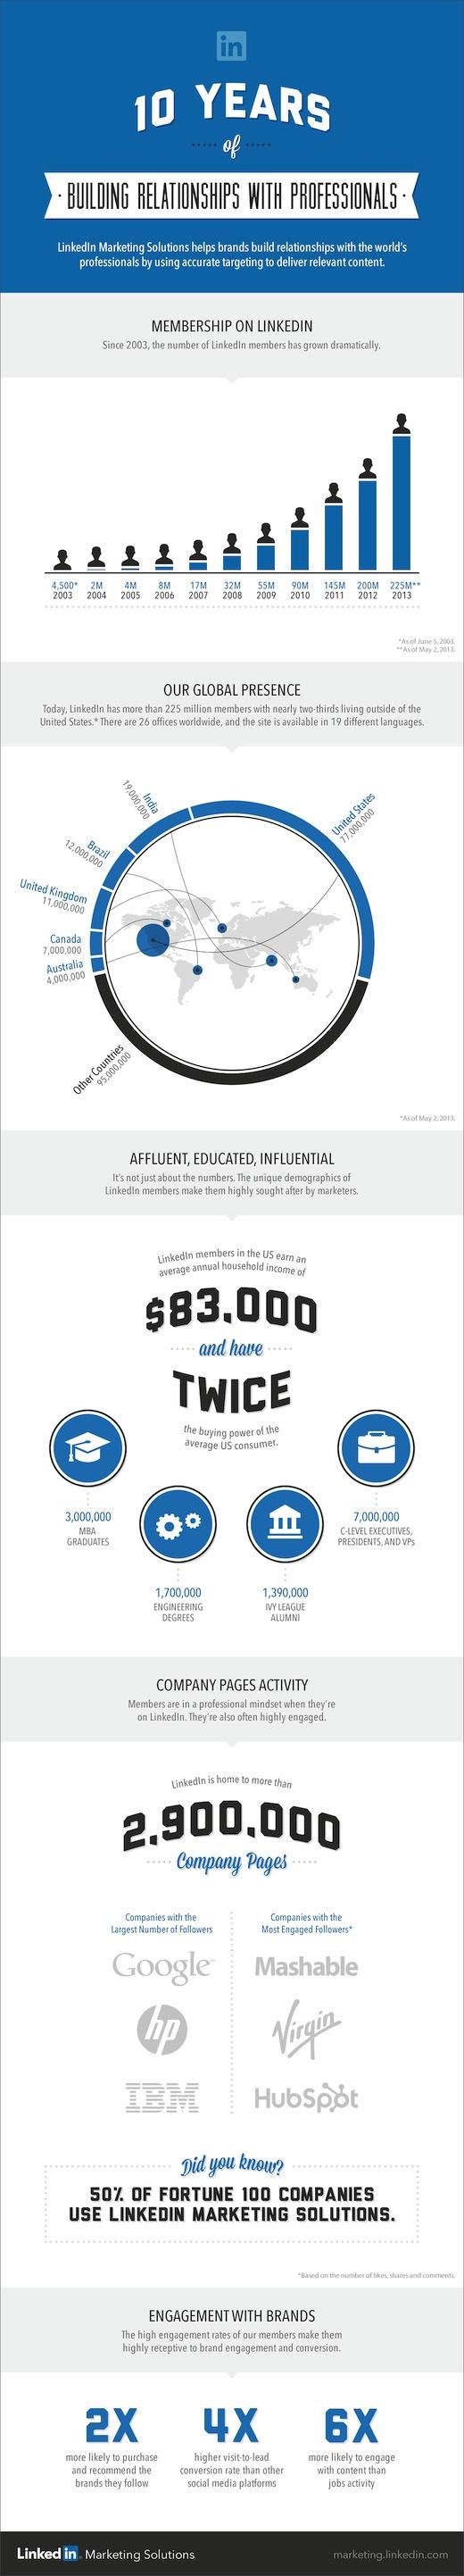 LinkedIn-10th-Anniversary-Infographic.jpeg